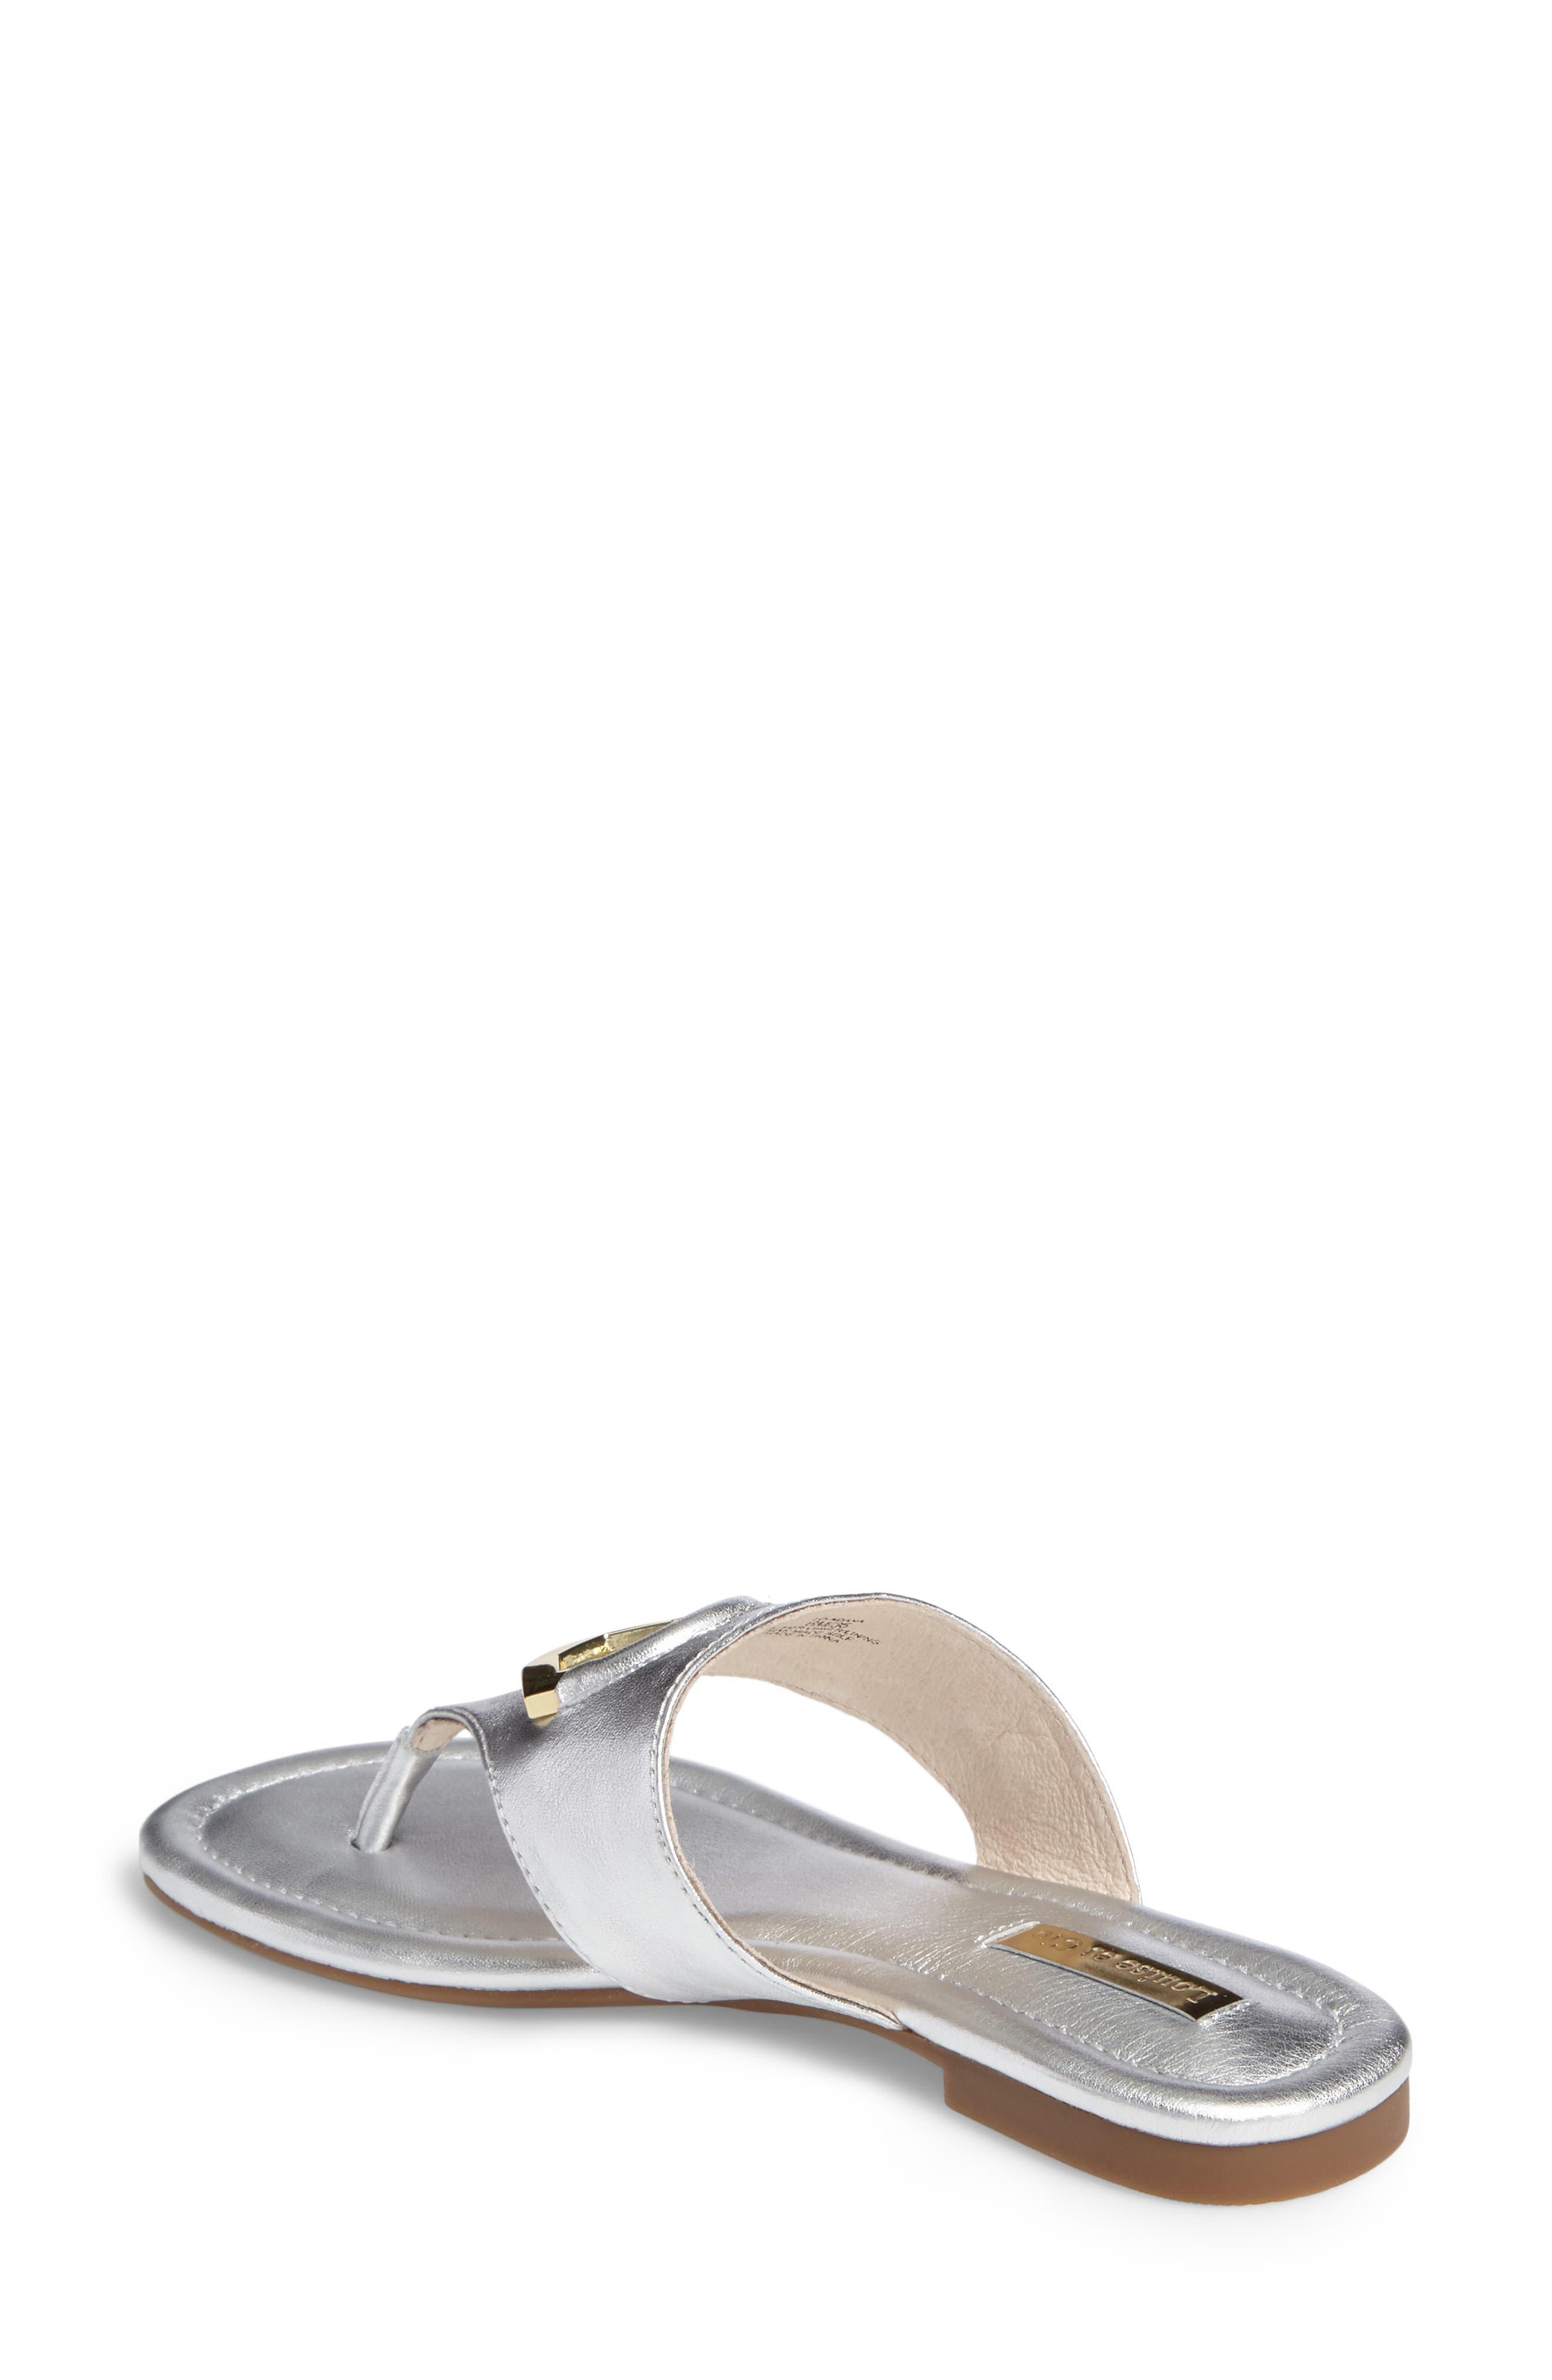 Adana Flip Flop,                             Alternate thumbnail 2, color,                             Sterling Leather